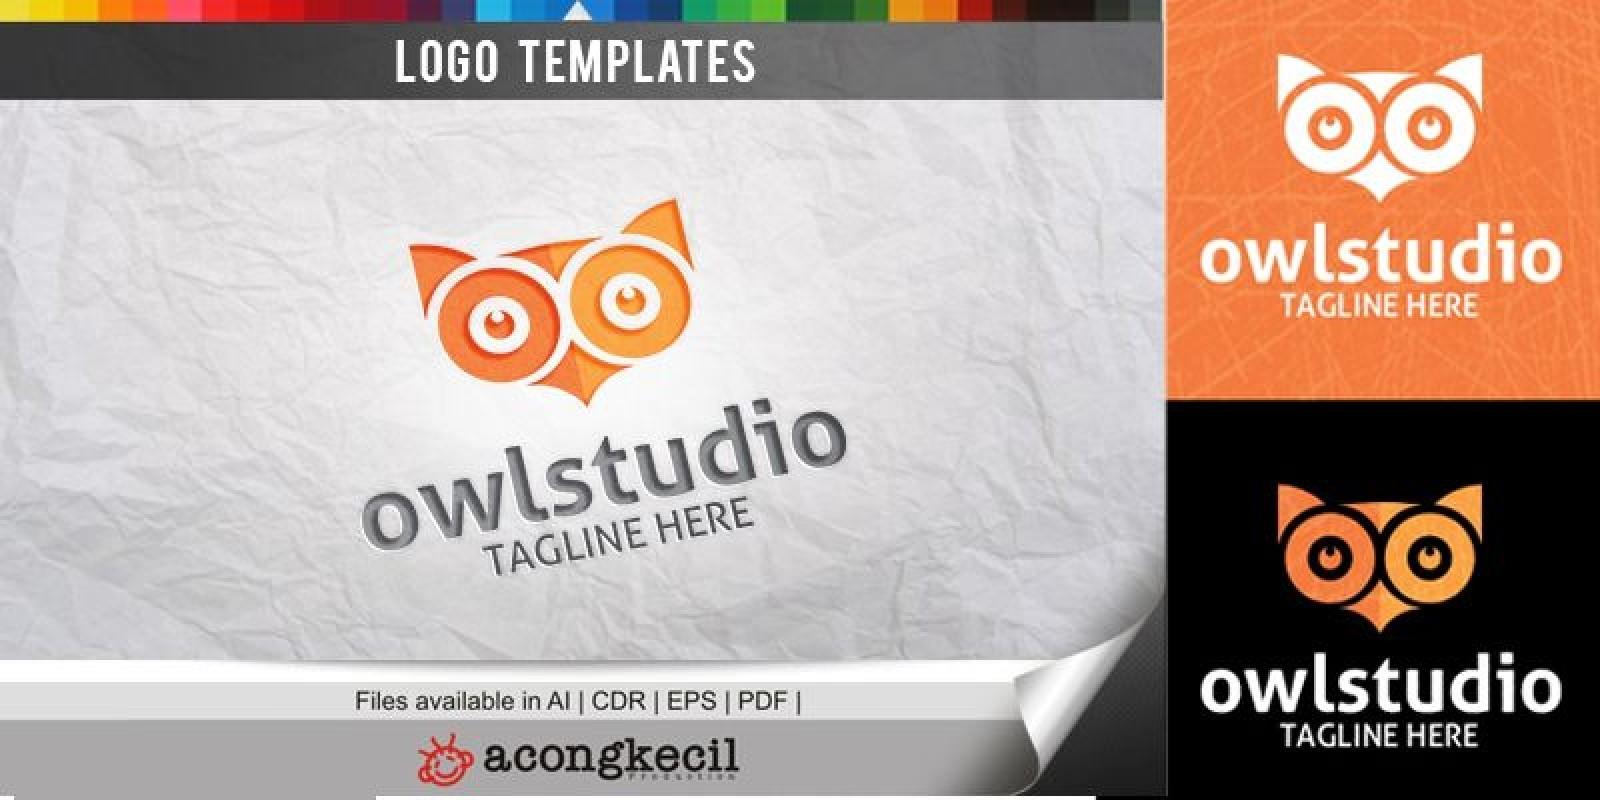 OwlStudio - Logo Template